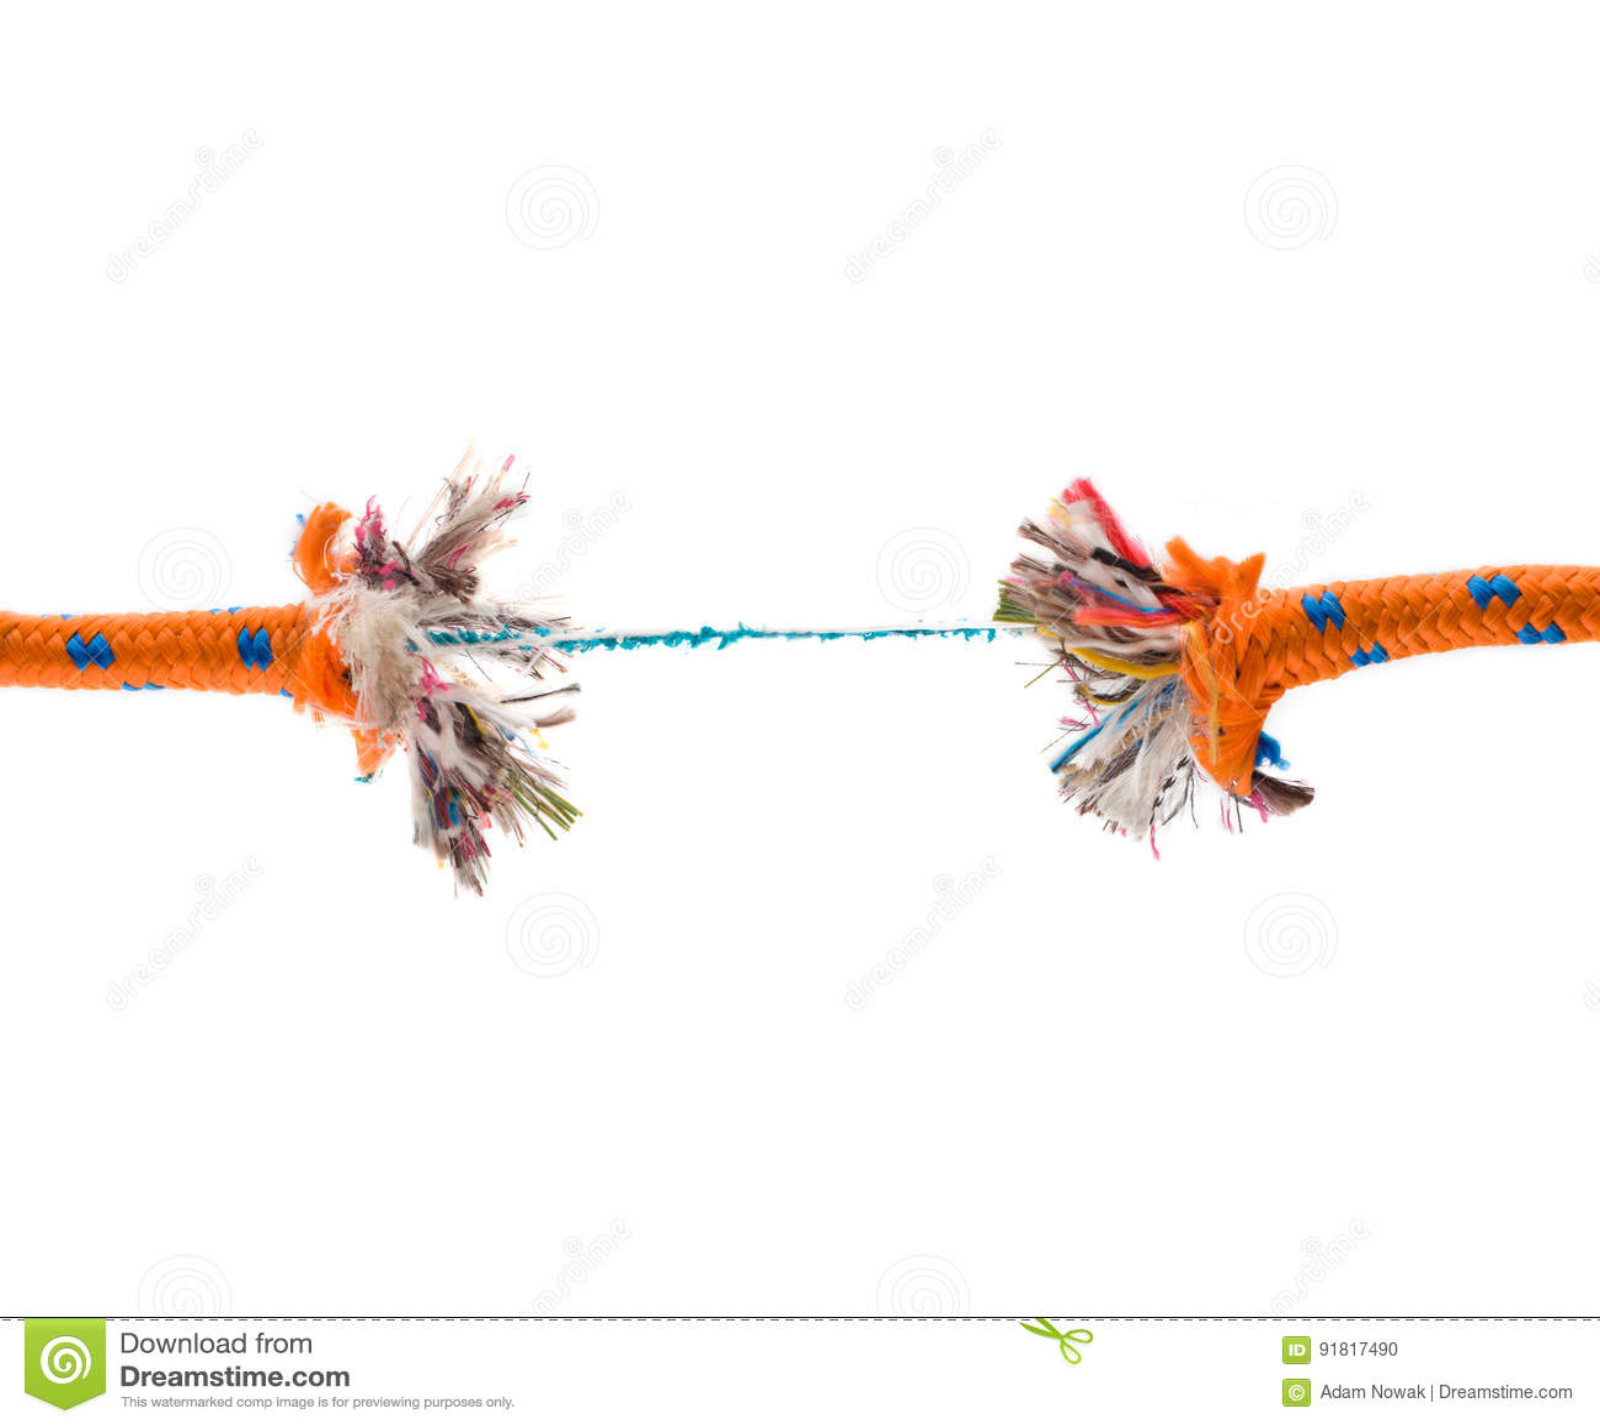 Rompiendo la cuerda - riesgo